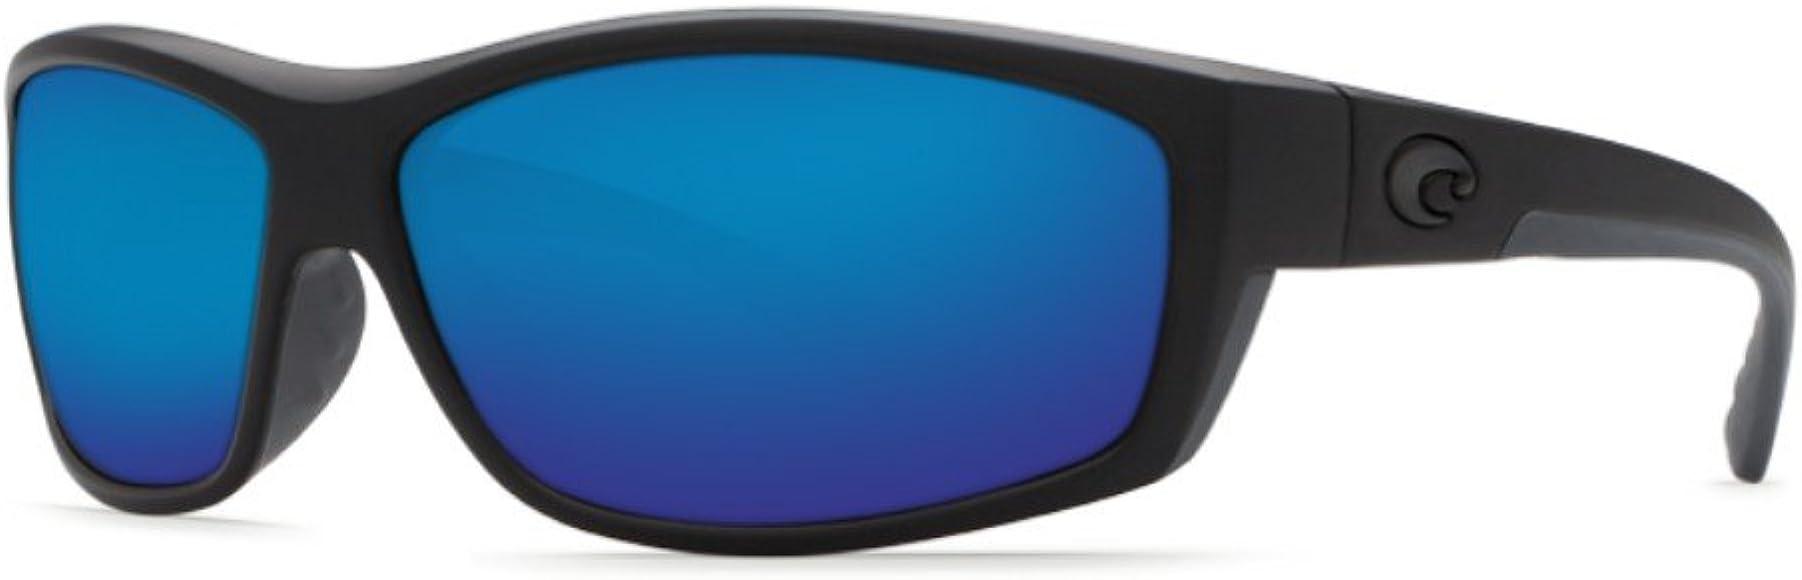 New Costa Del Mar Saltbreak Sunglasses Silver frame Copper 580P Polarized lens